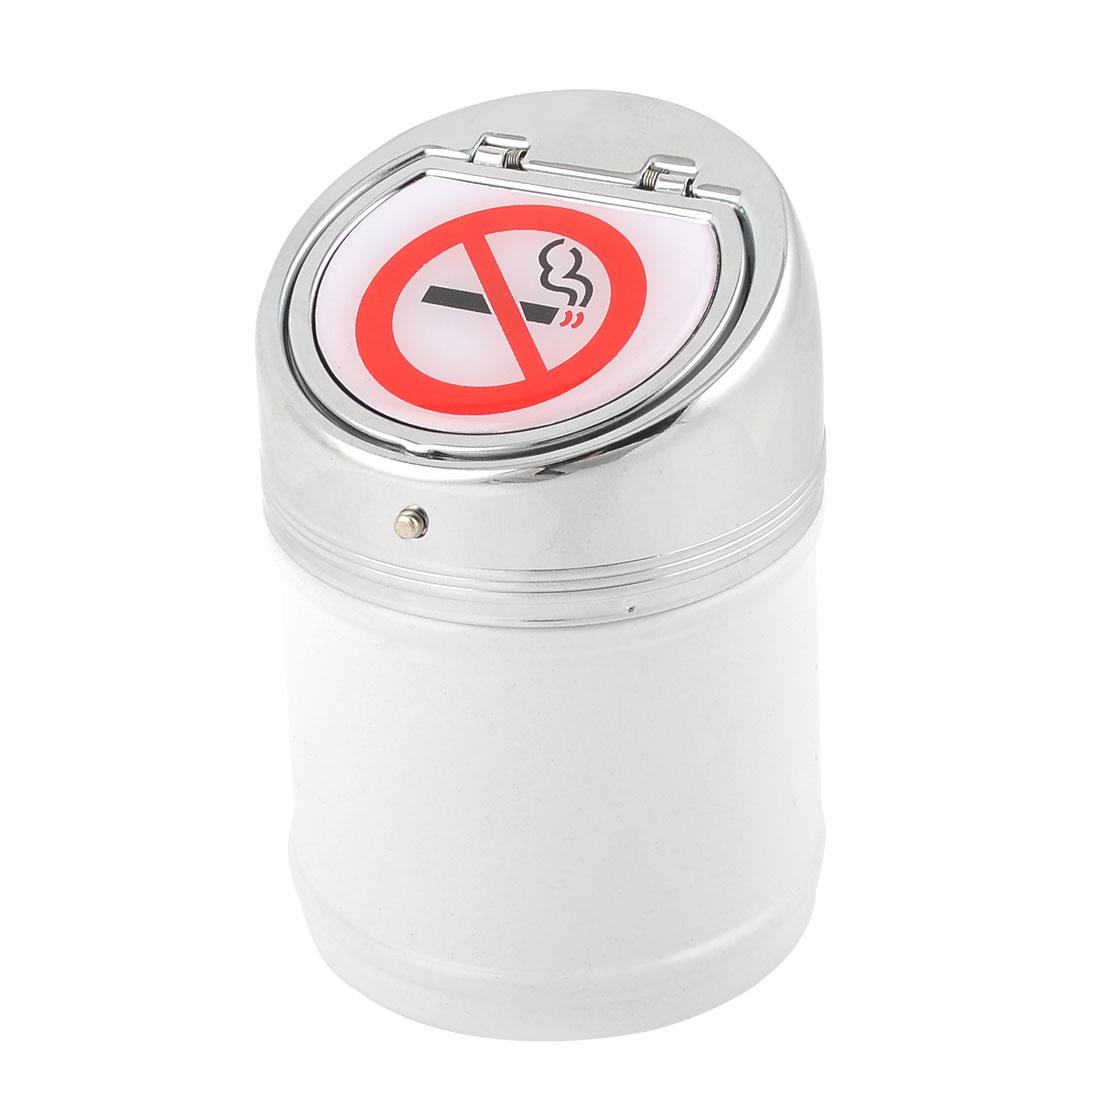 "Silver Tone Lid Automatic Locking White Cylinder Cigarette Ashtray 2.6"" x 4"""